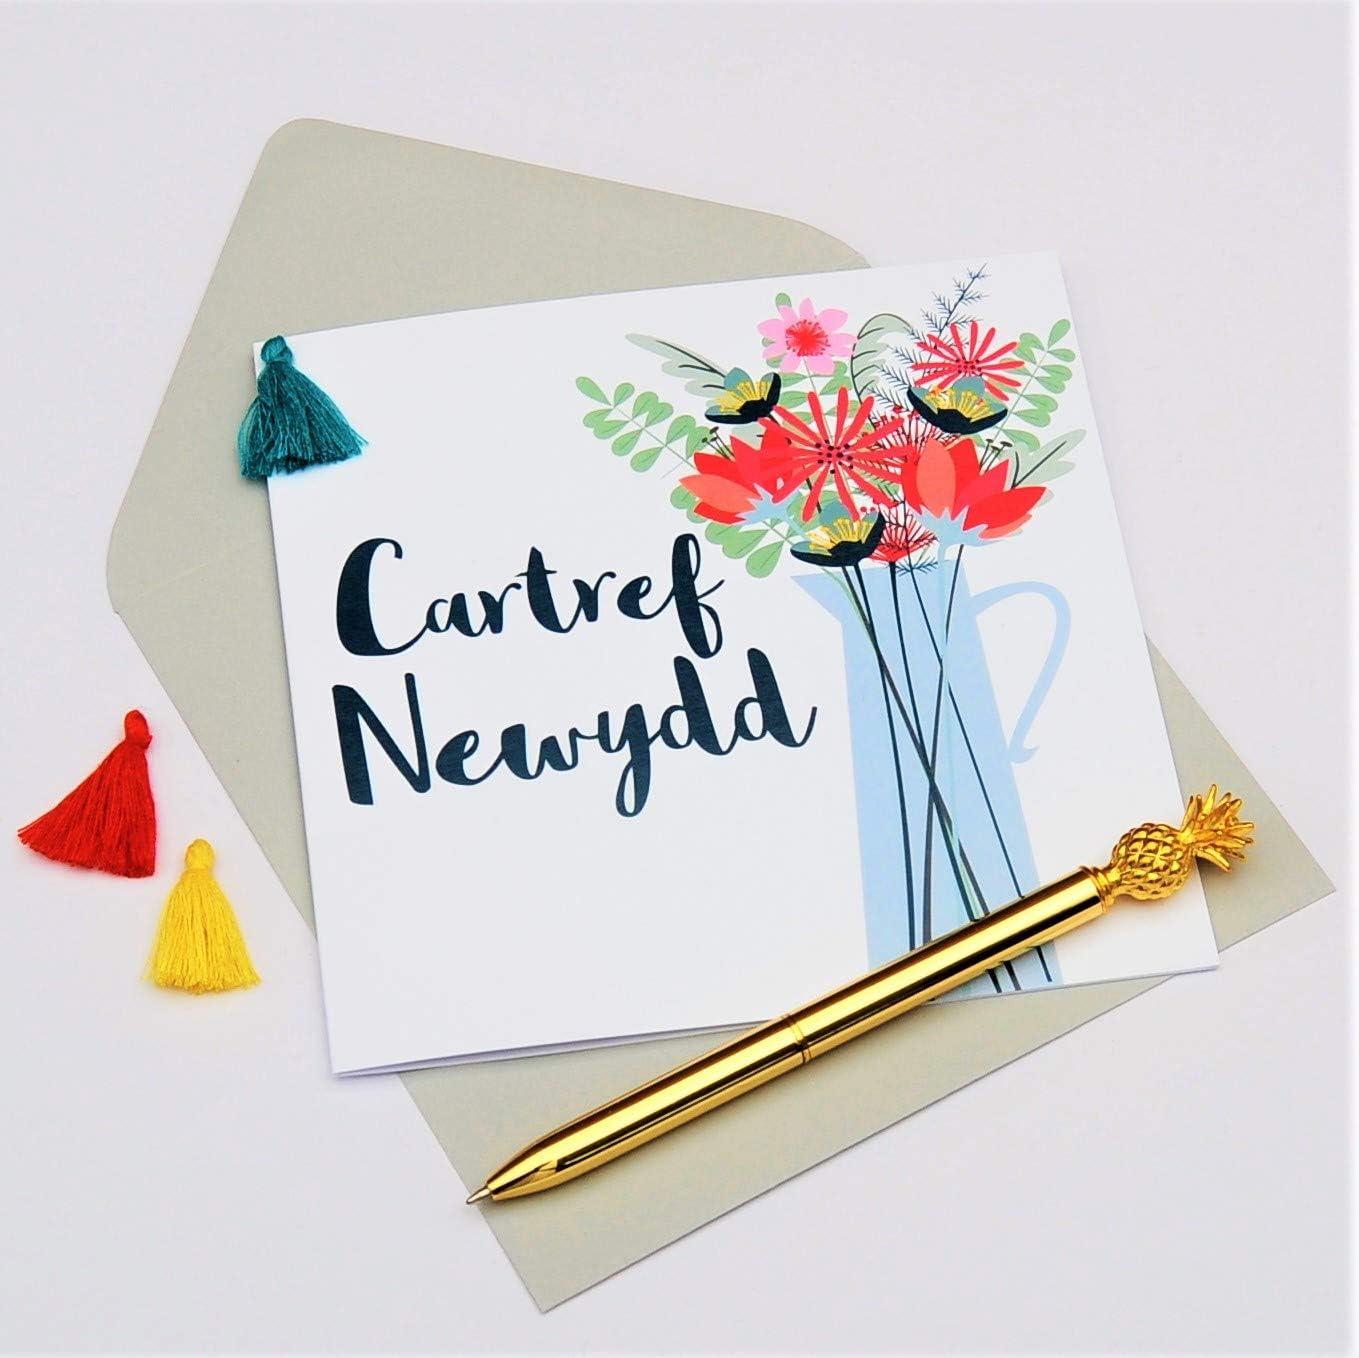 New Home Vase of Flowers Tassel Embellished Welsh Language New Home Greeting Card